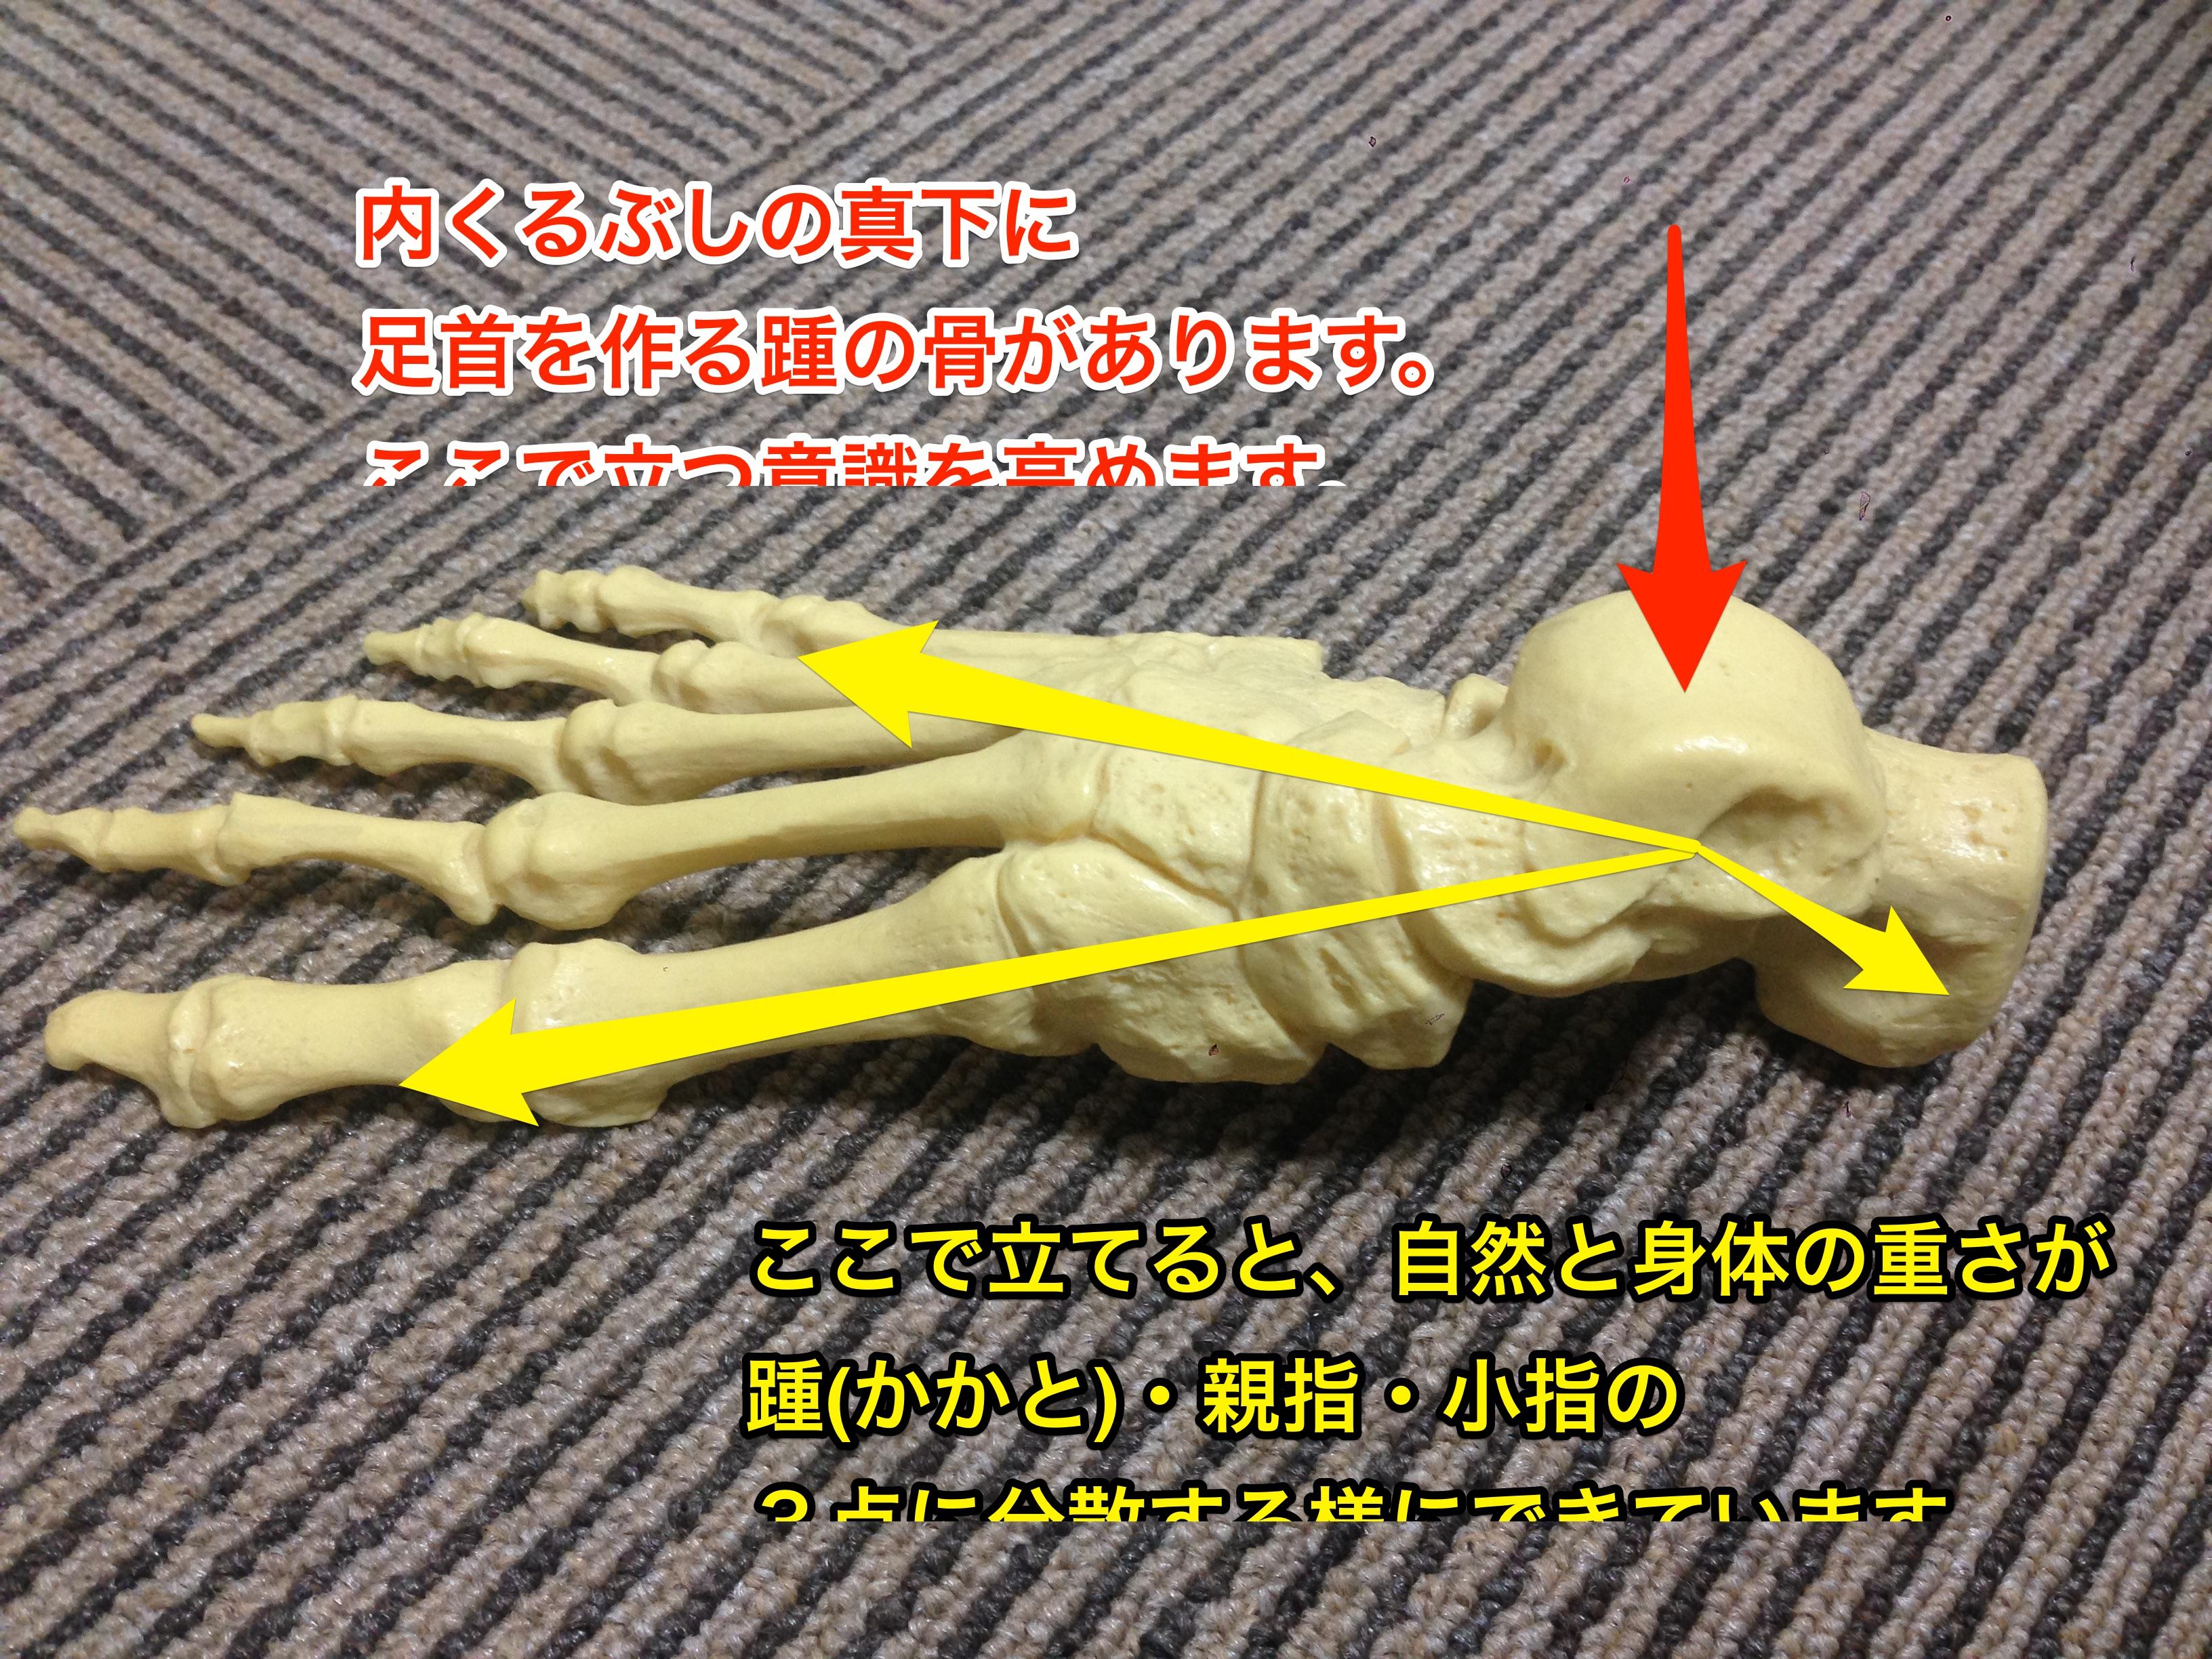 X,O脚などの形は重力の受け方で変わる!!